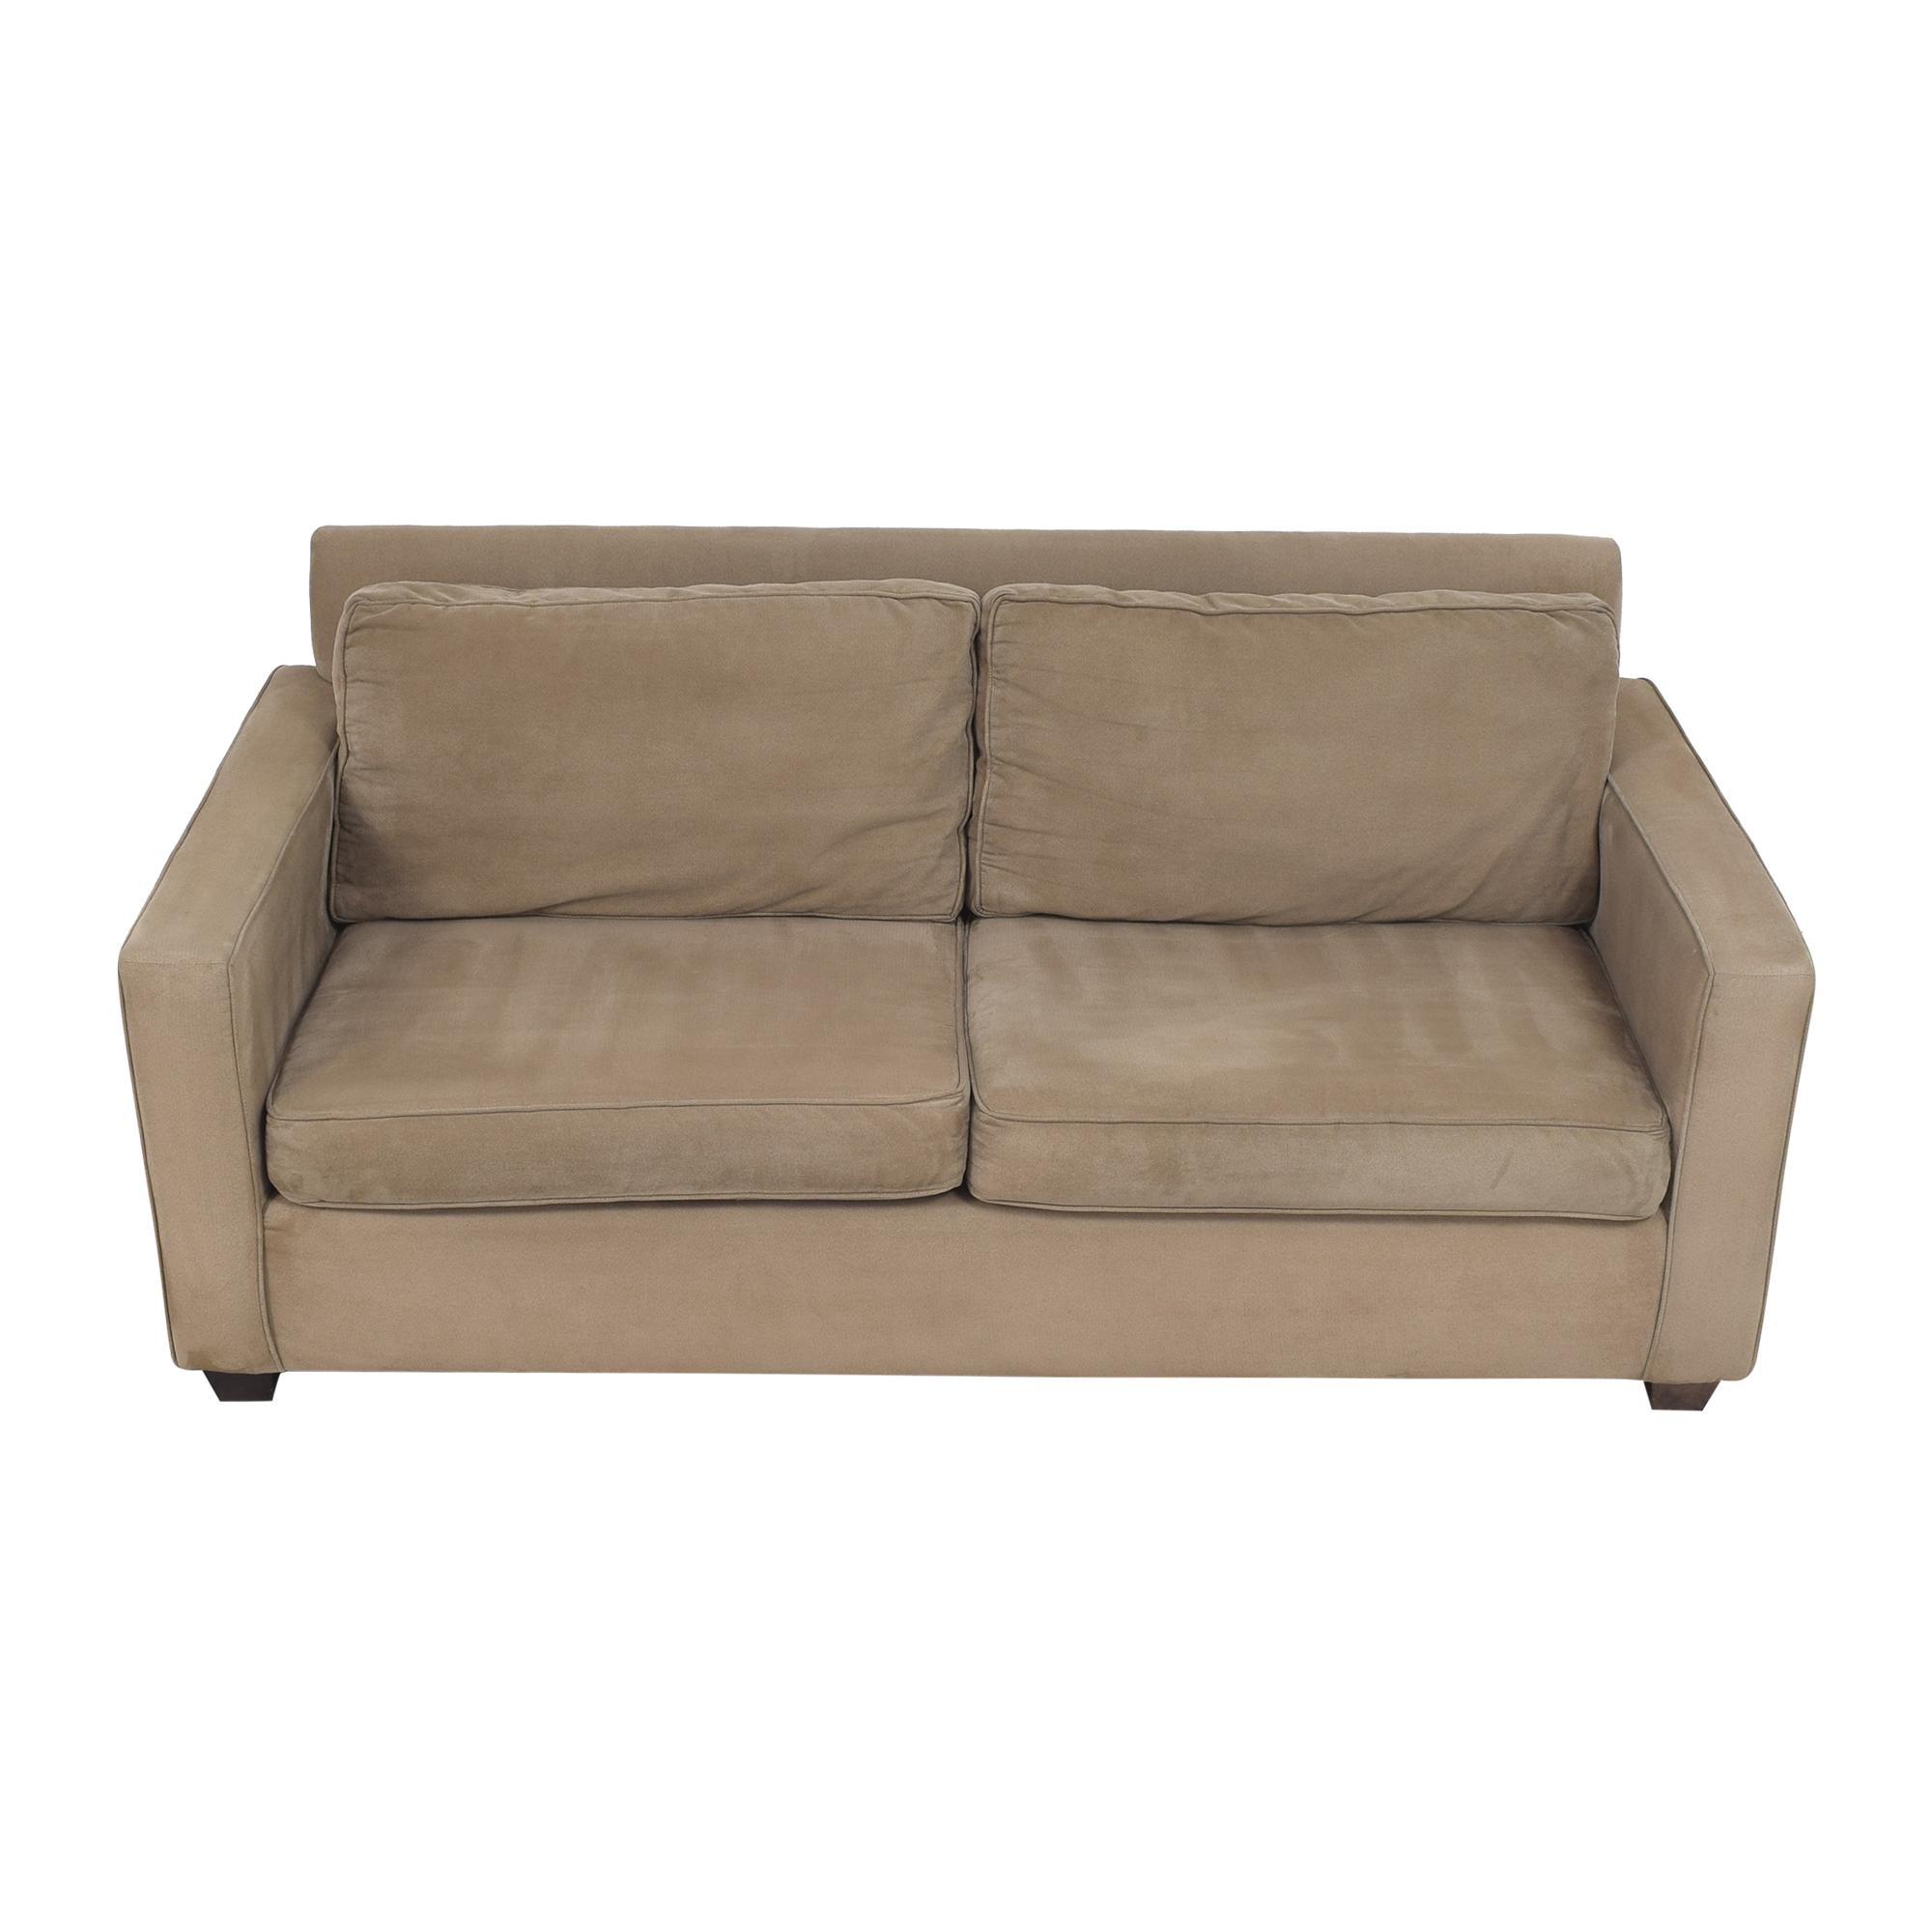 buy West Elm Henry Two Cushion Sofa West Elm